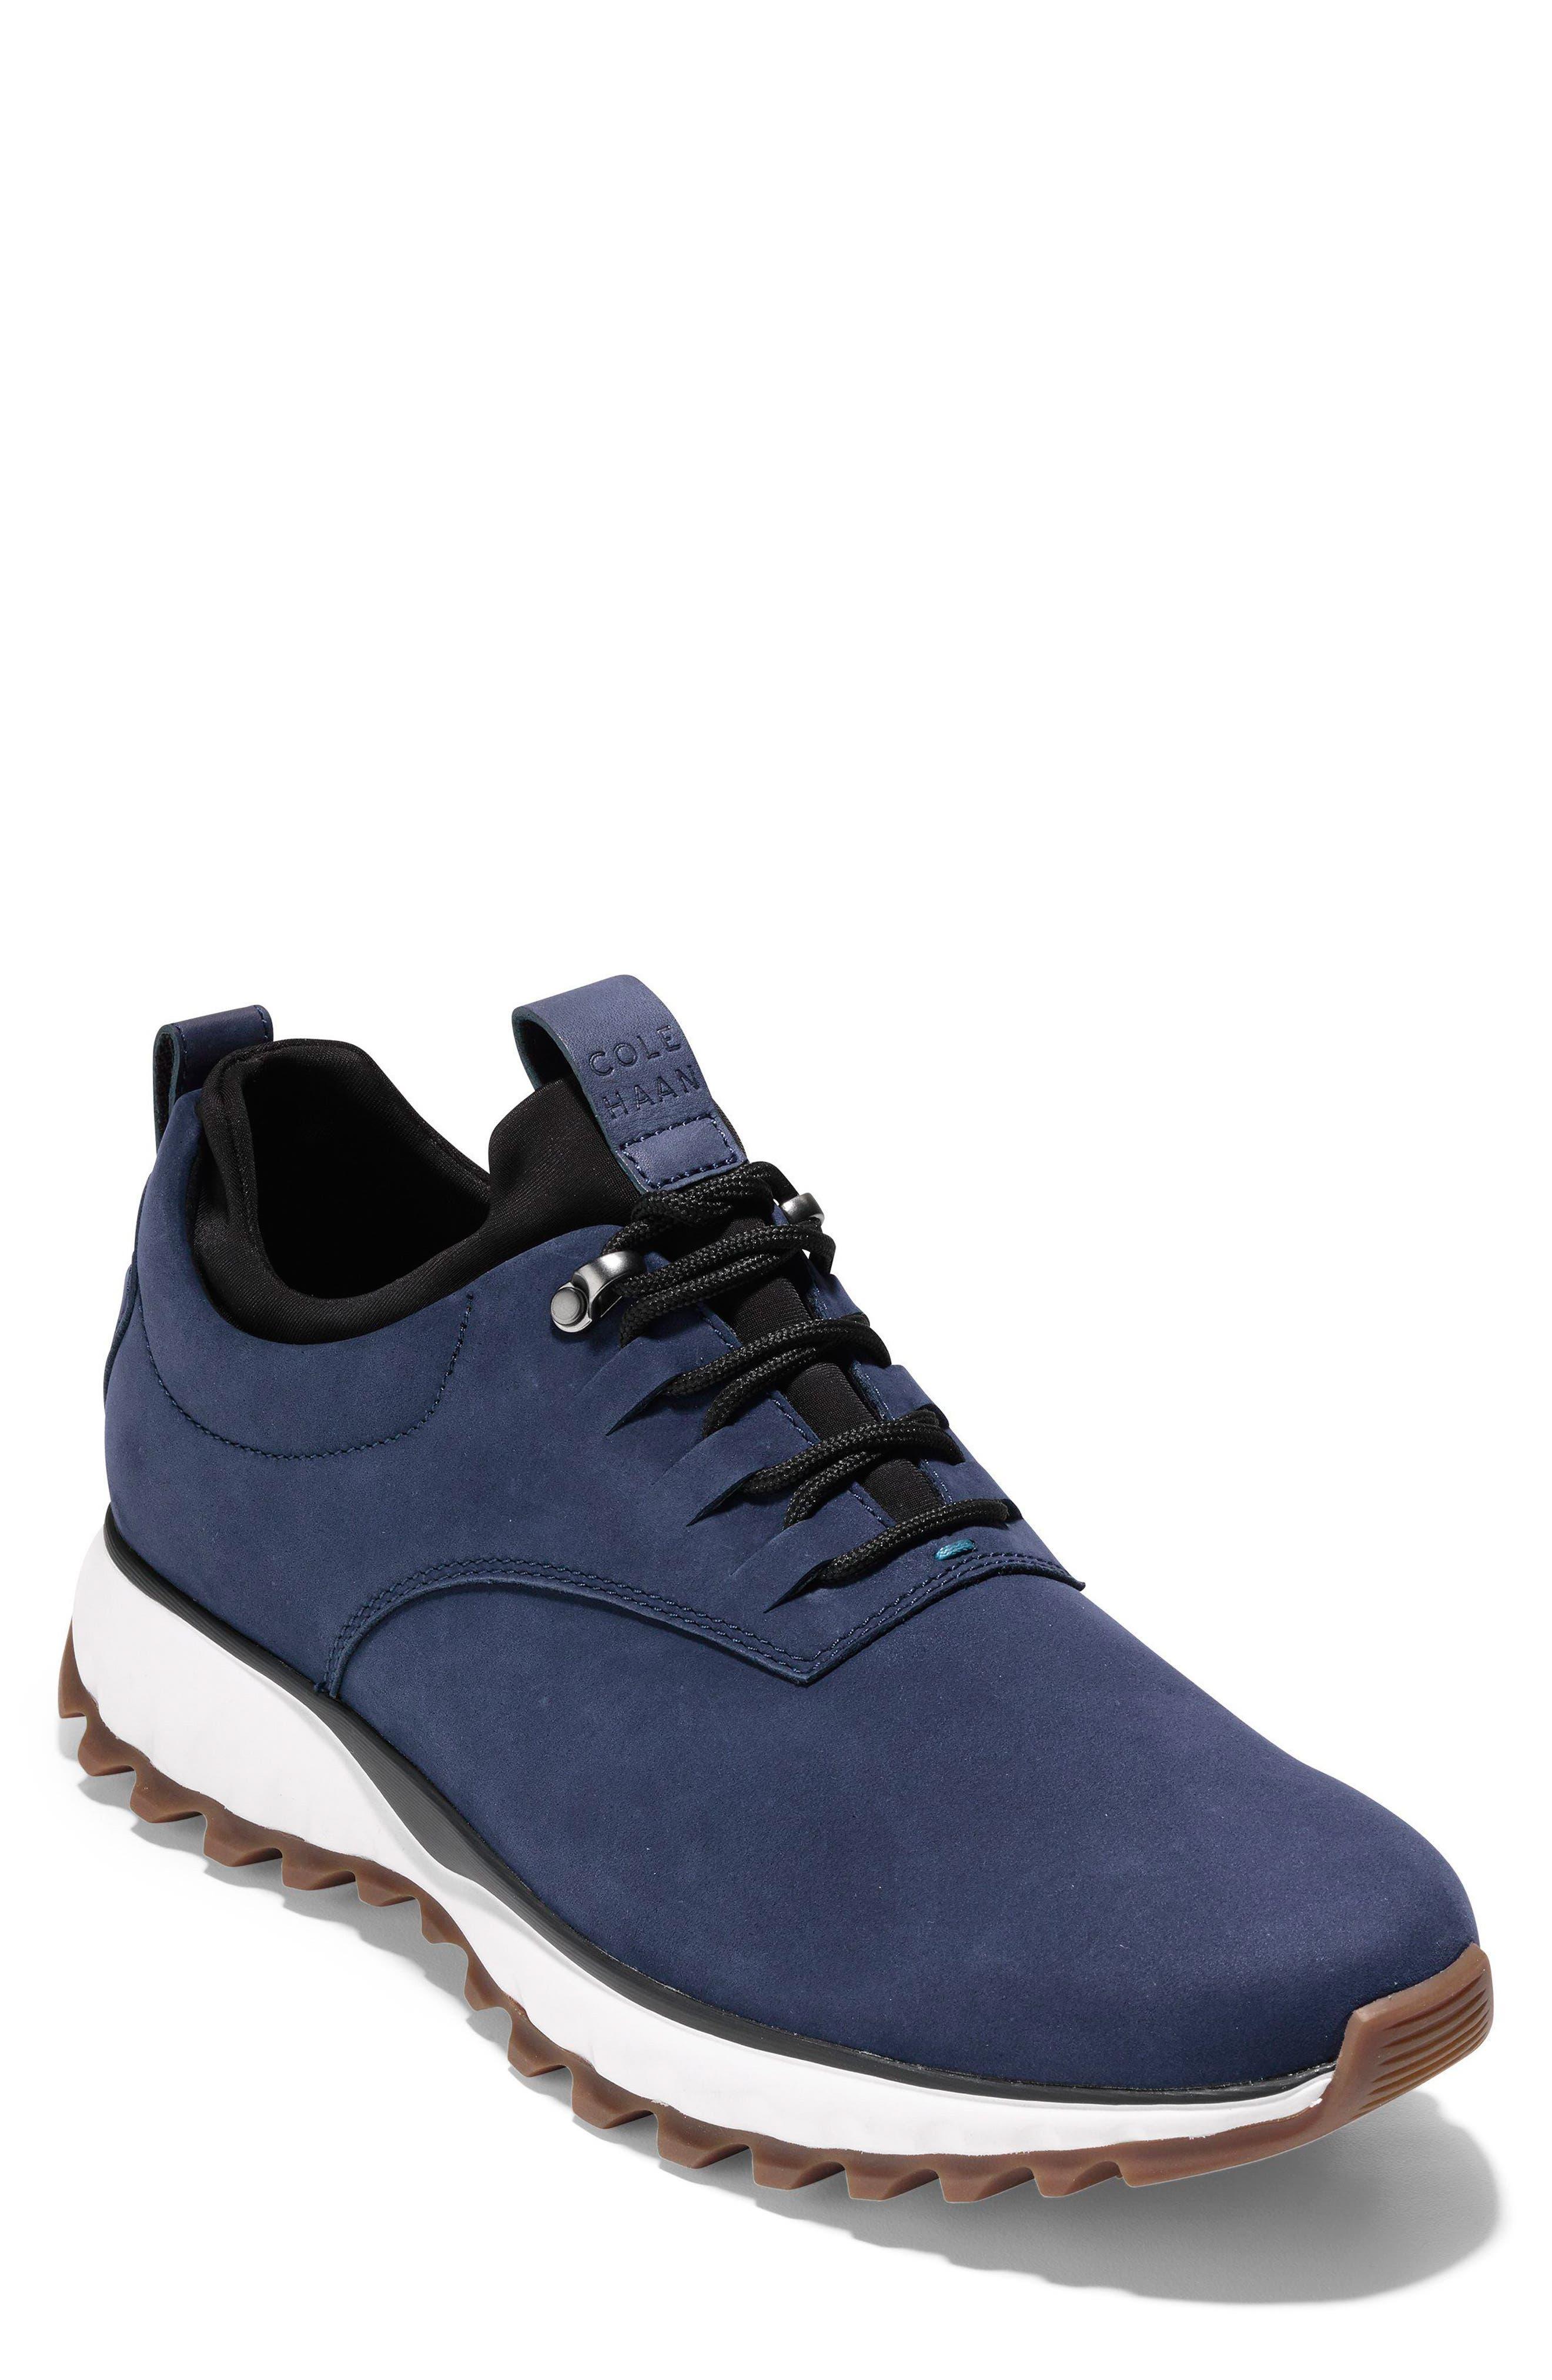 GrandExpløre All Terrain Waterproof Sneaker,                         Main,                         color, Marine Blue Nubuck